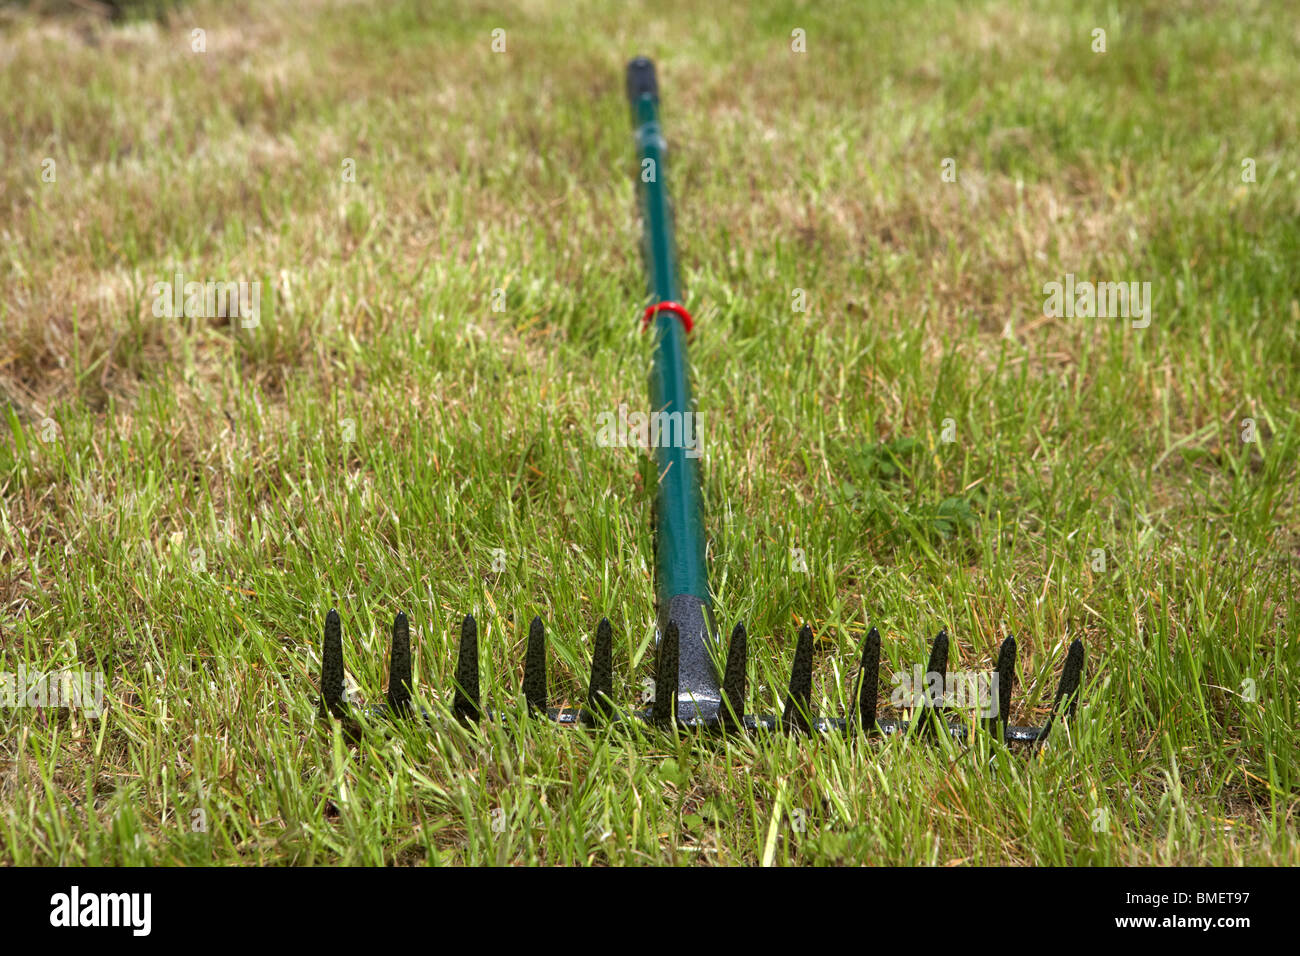 upturned garden rake lying discarded in freshly cut grass in a garden in the uk ireland - Stock Image